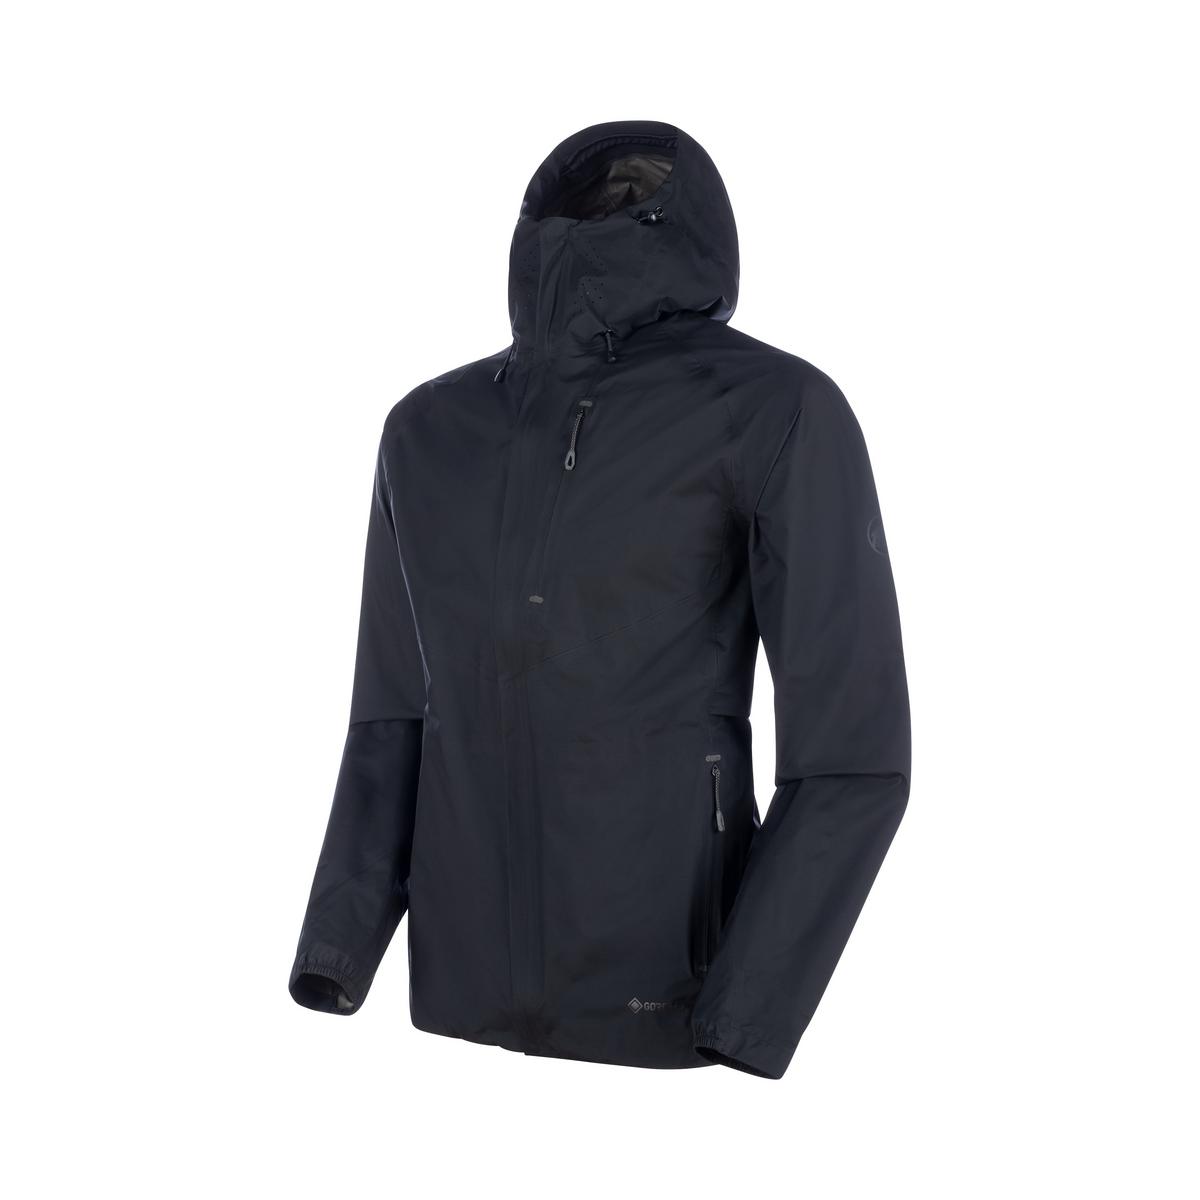 competitive price e6b2c a8e99 Convey Pro GTX HS Hooded Jacket Men